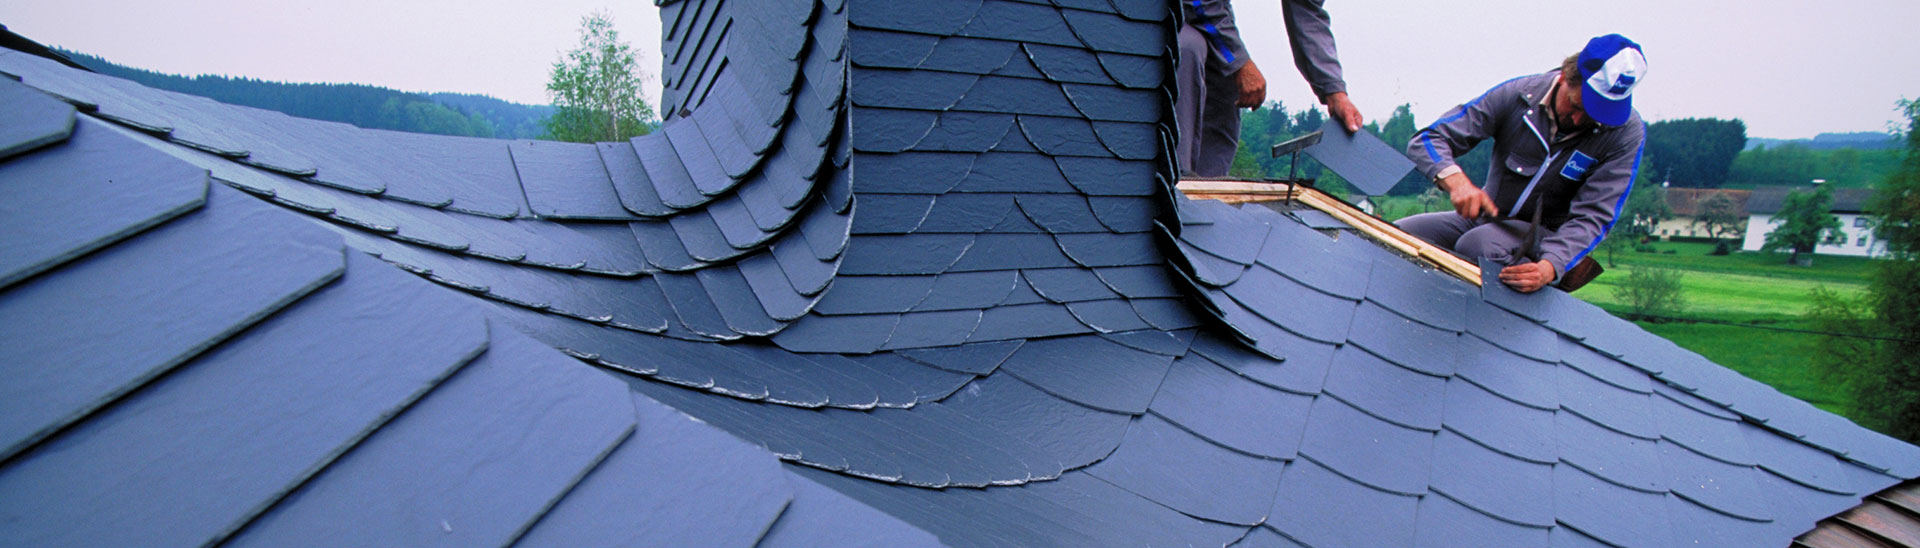 Dach aus Eternit